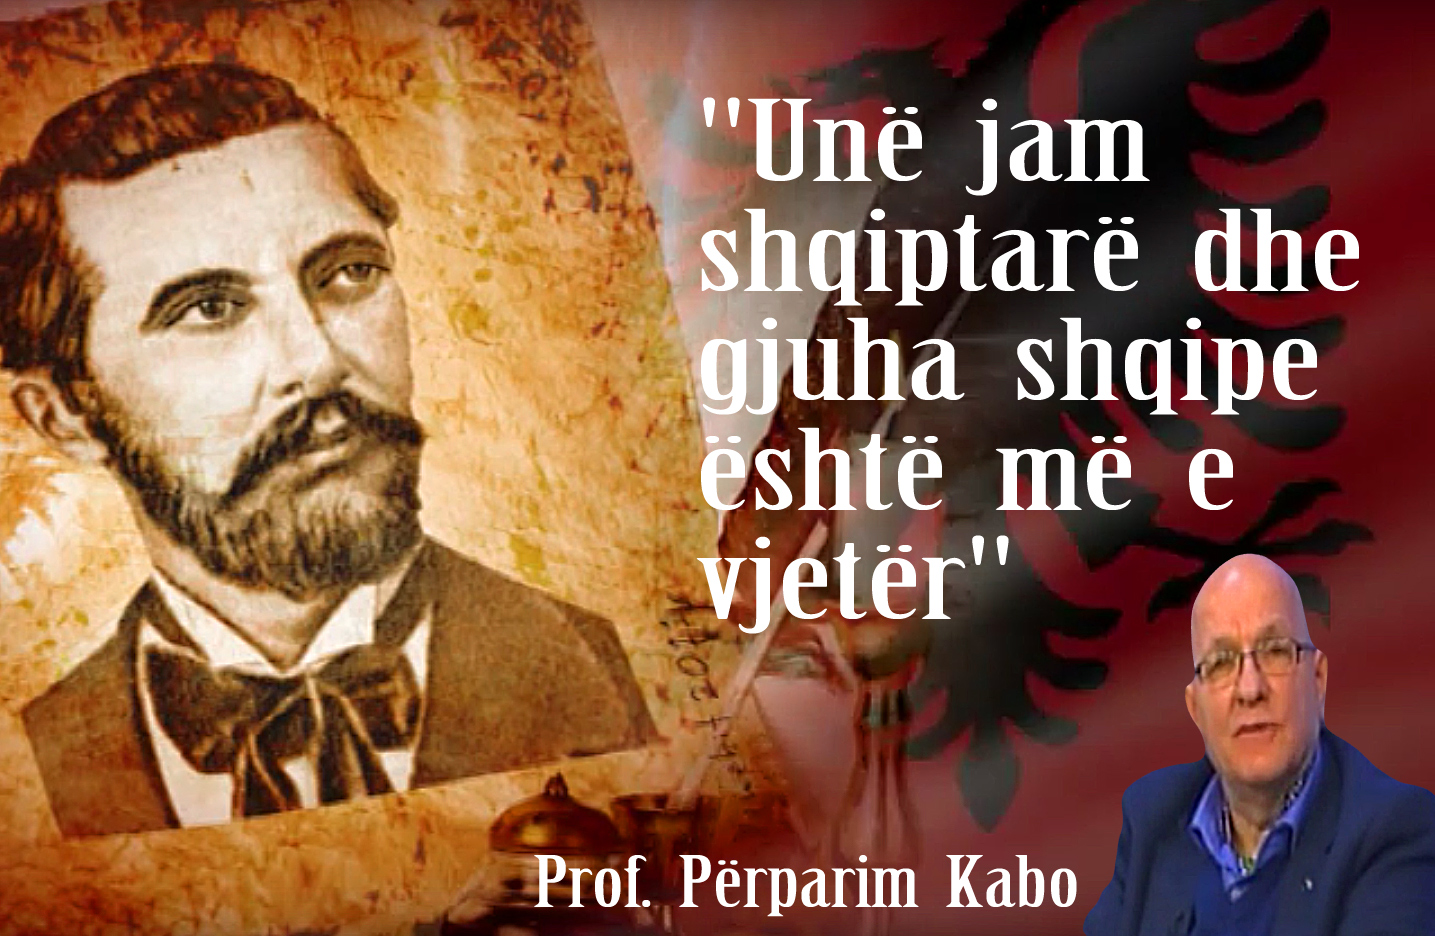 prof_perparim_kabo